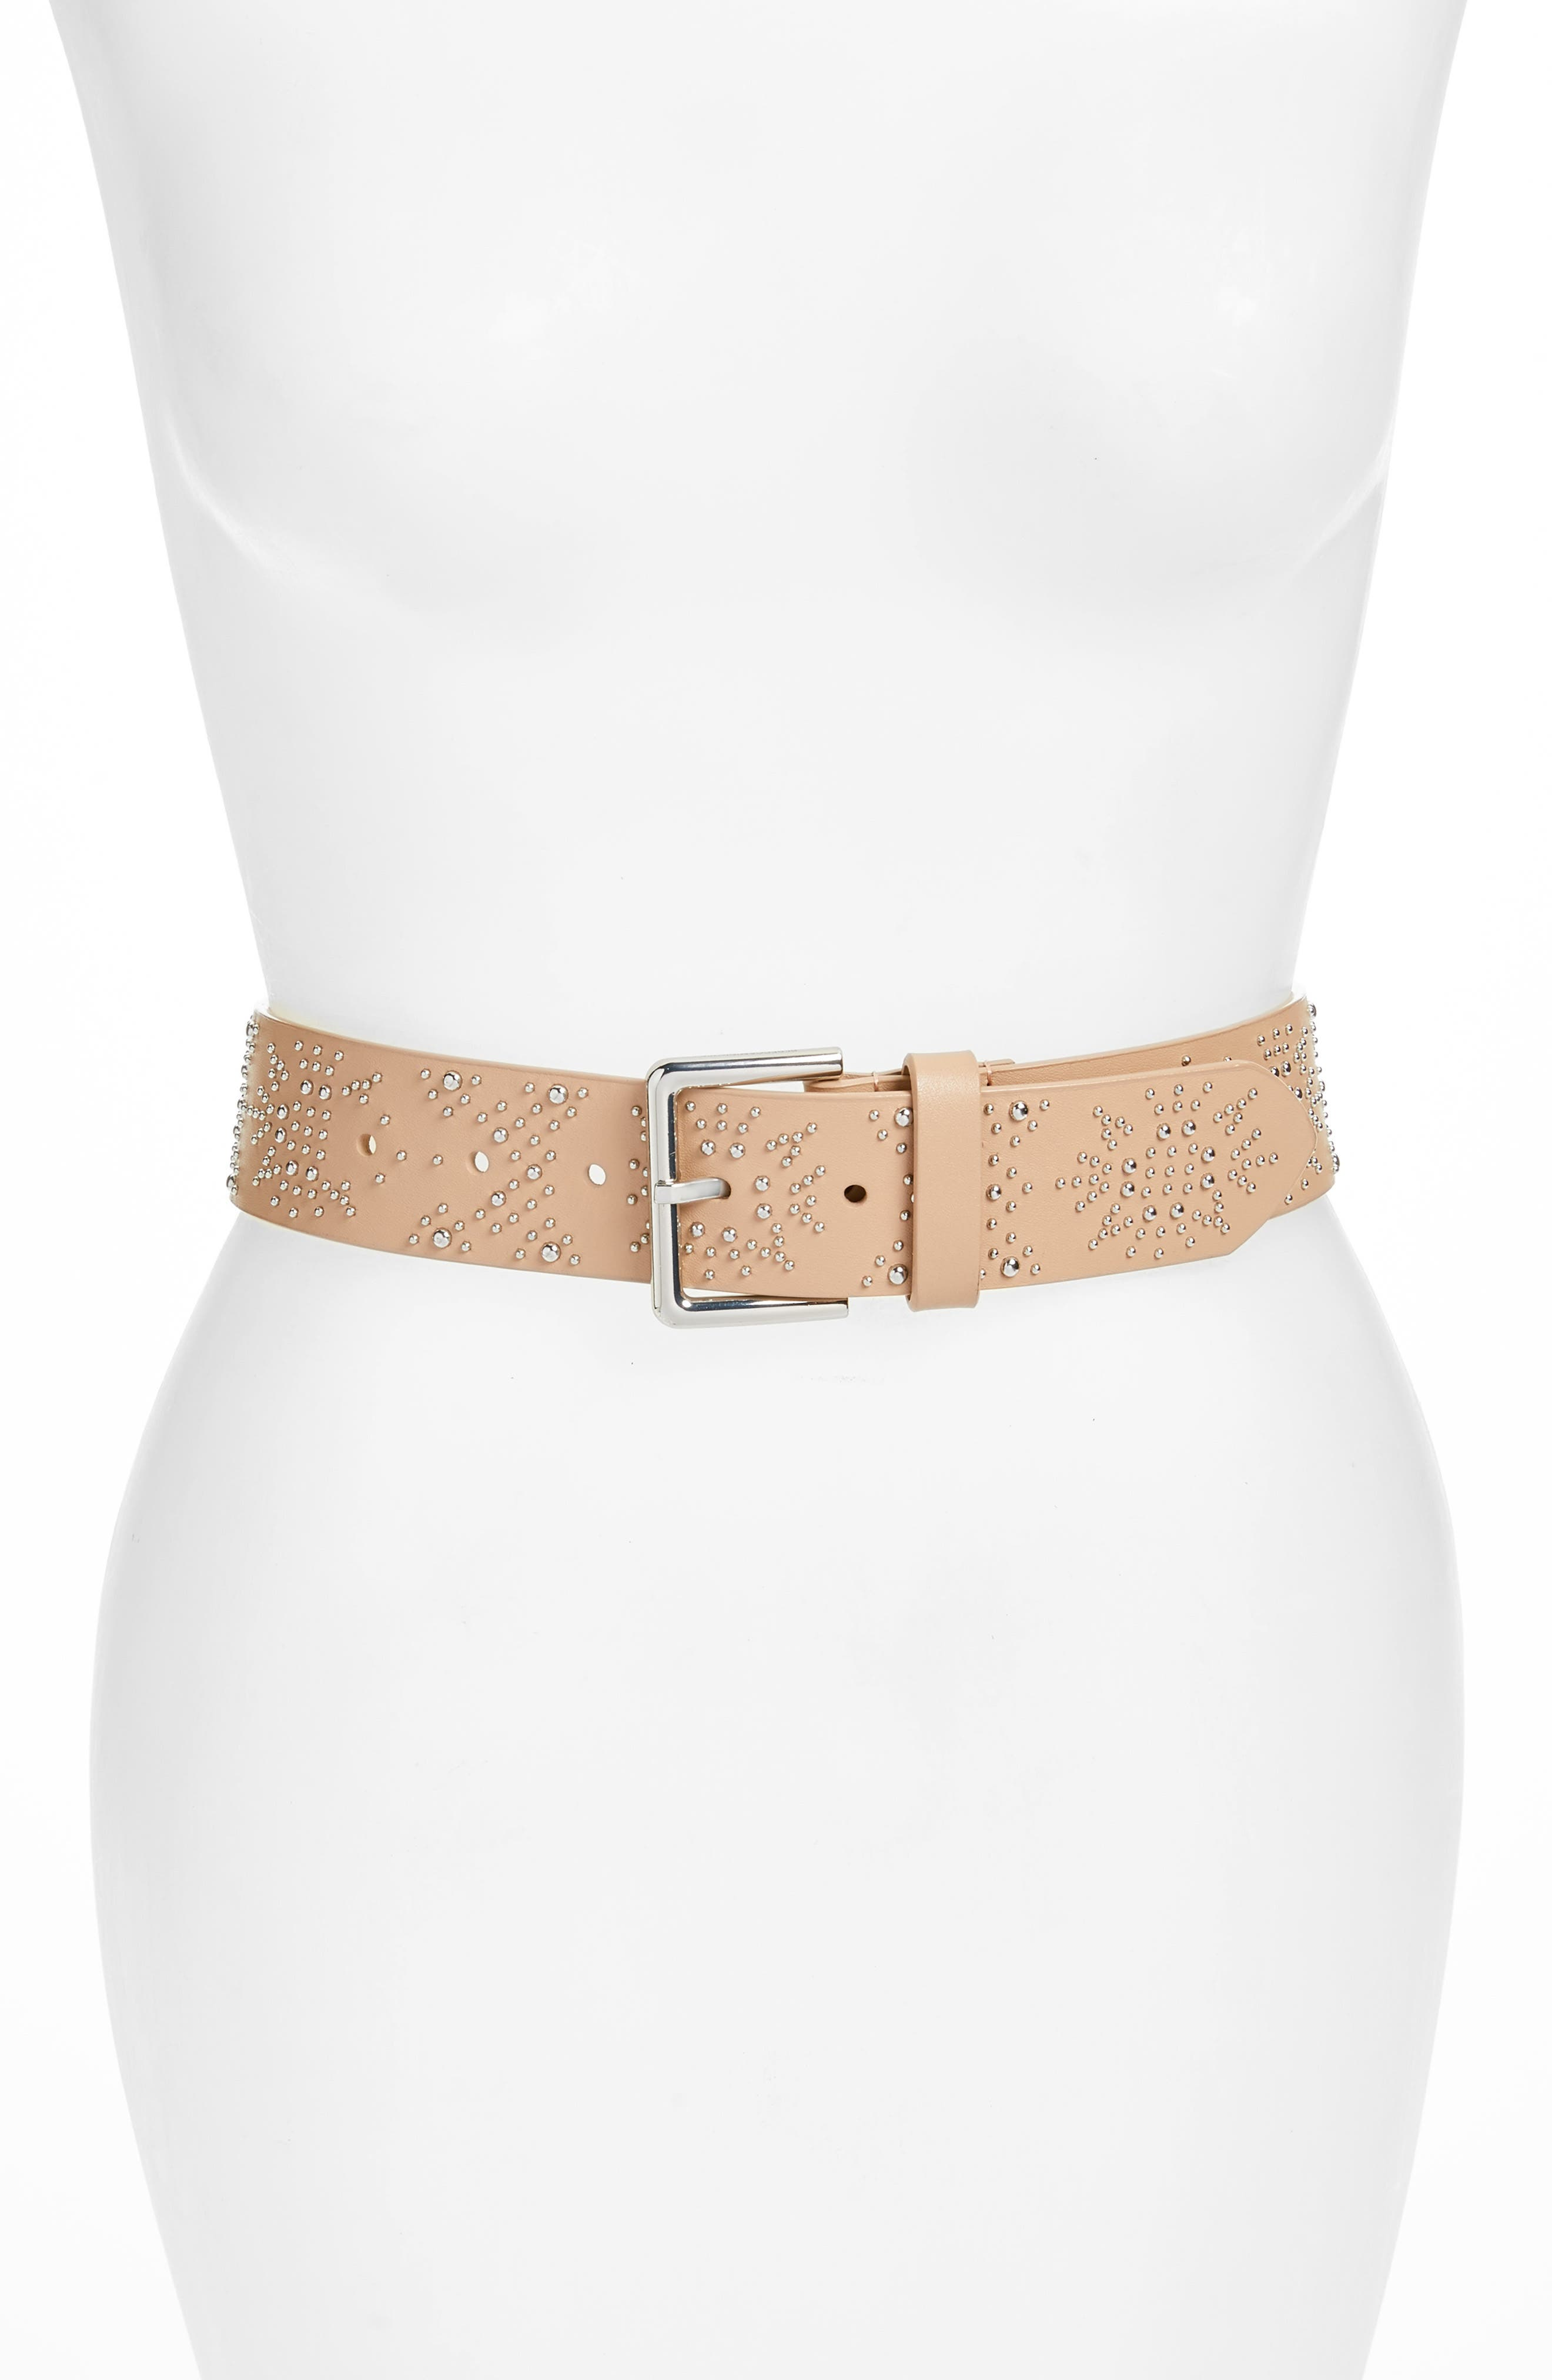 Rebecca Minkoff Mary Studded Nappa Leather Belt